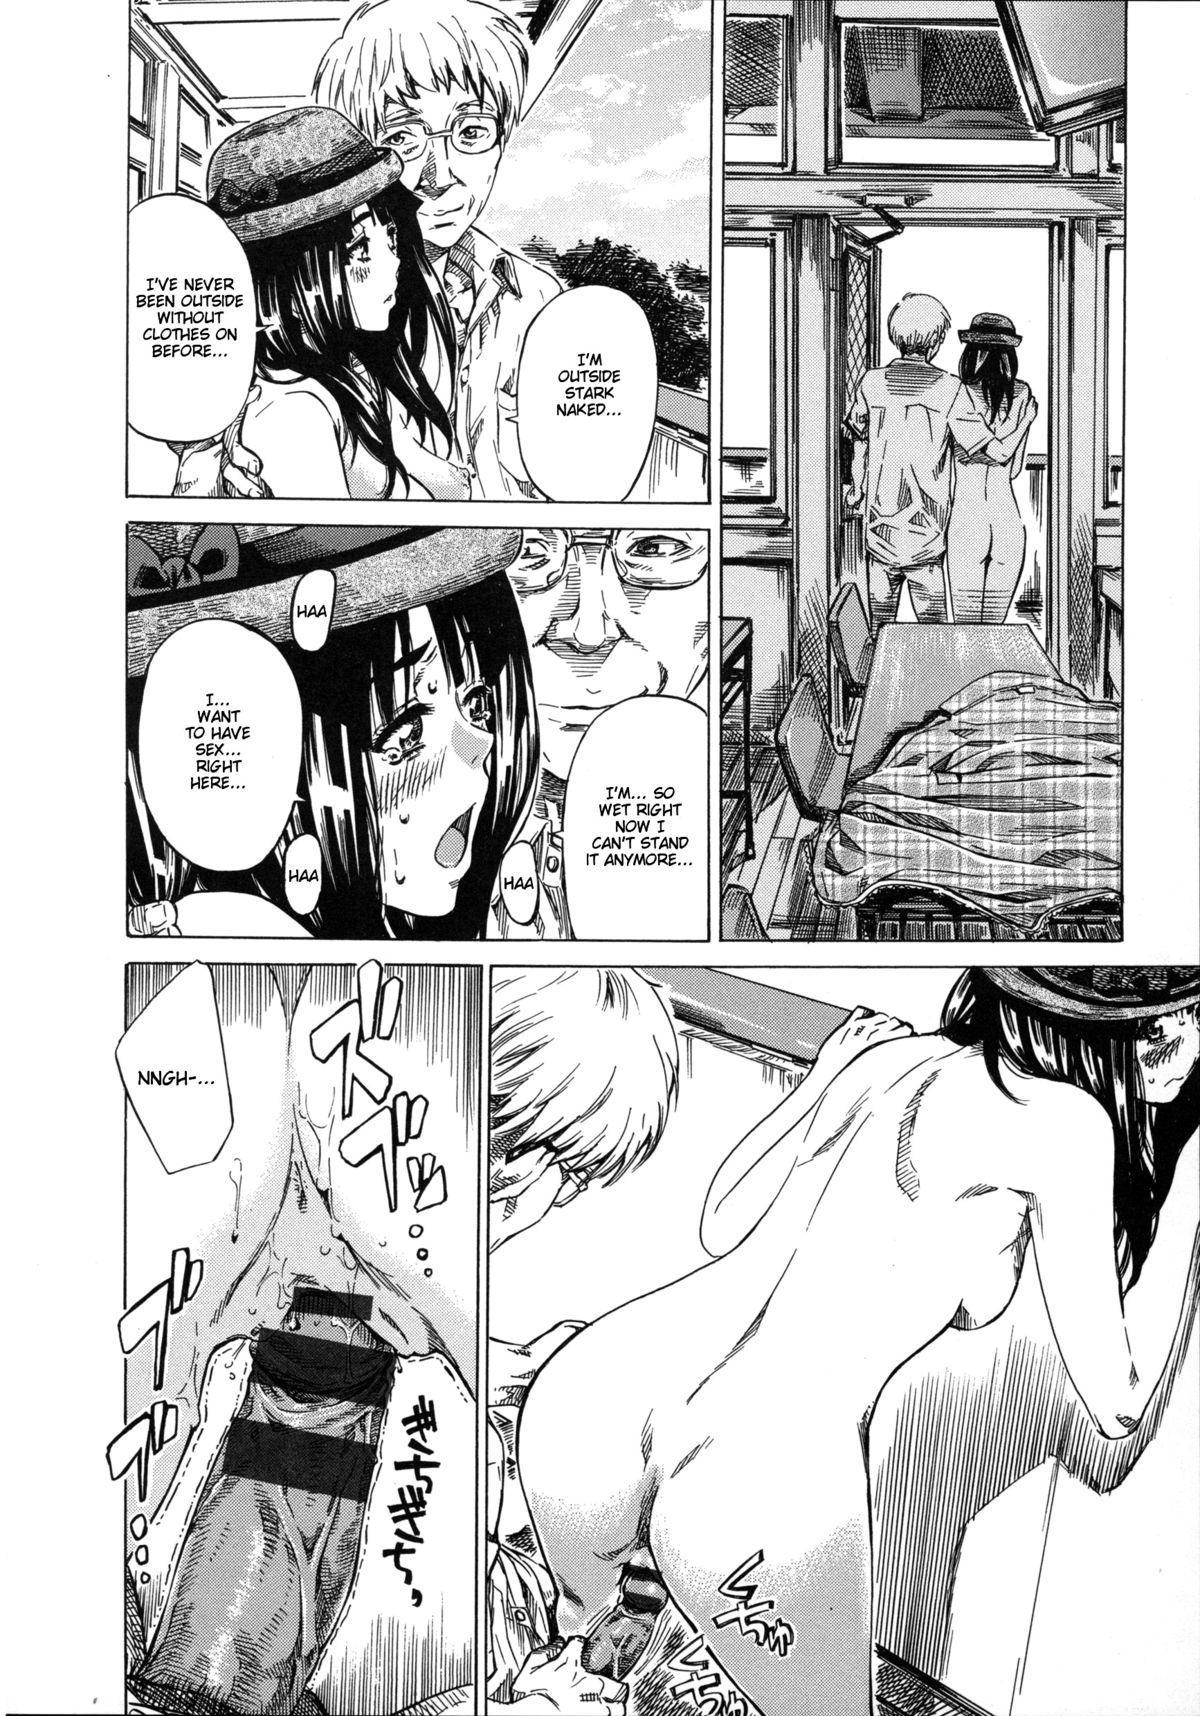 Kashiwazaki Miki wa Ironna Basho de Zenra Sanpo Shitemita   Miki Kashiwazaki Goes Naked in All Sorts of Places Ch. 1-4 19